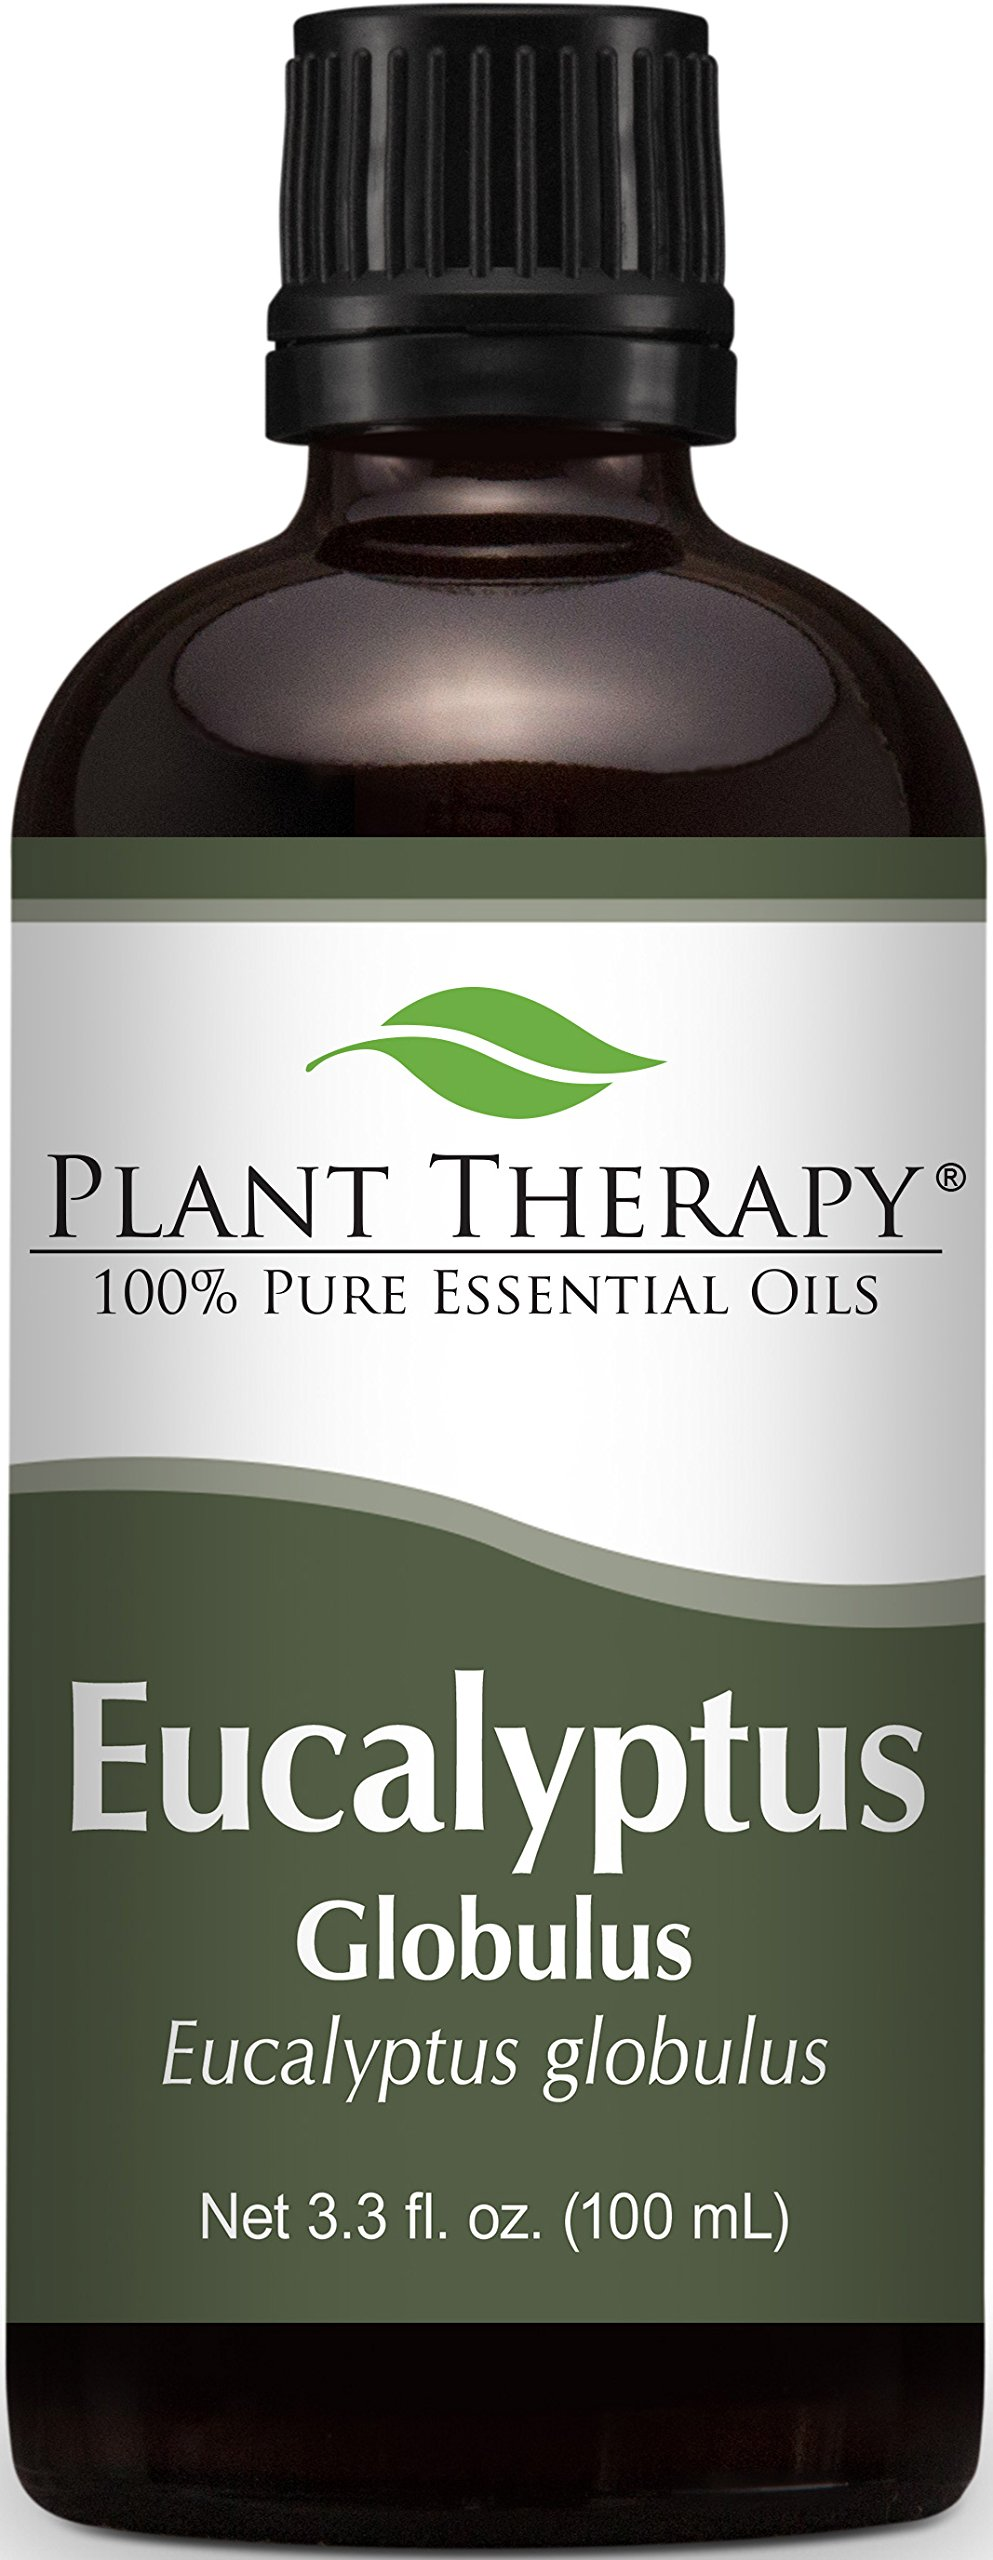 Plant Therapy Eucalyptus (Globulus) Essential Oil. 100% Pure, Undiluted, Therapeutic Grade. 100 ml (3.3 oz).